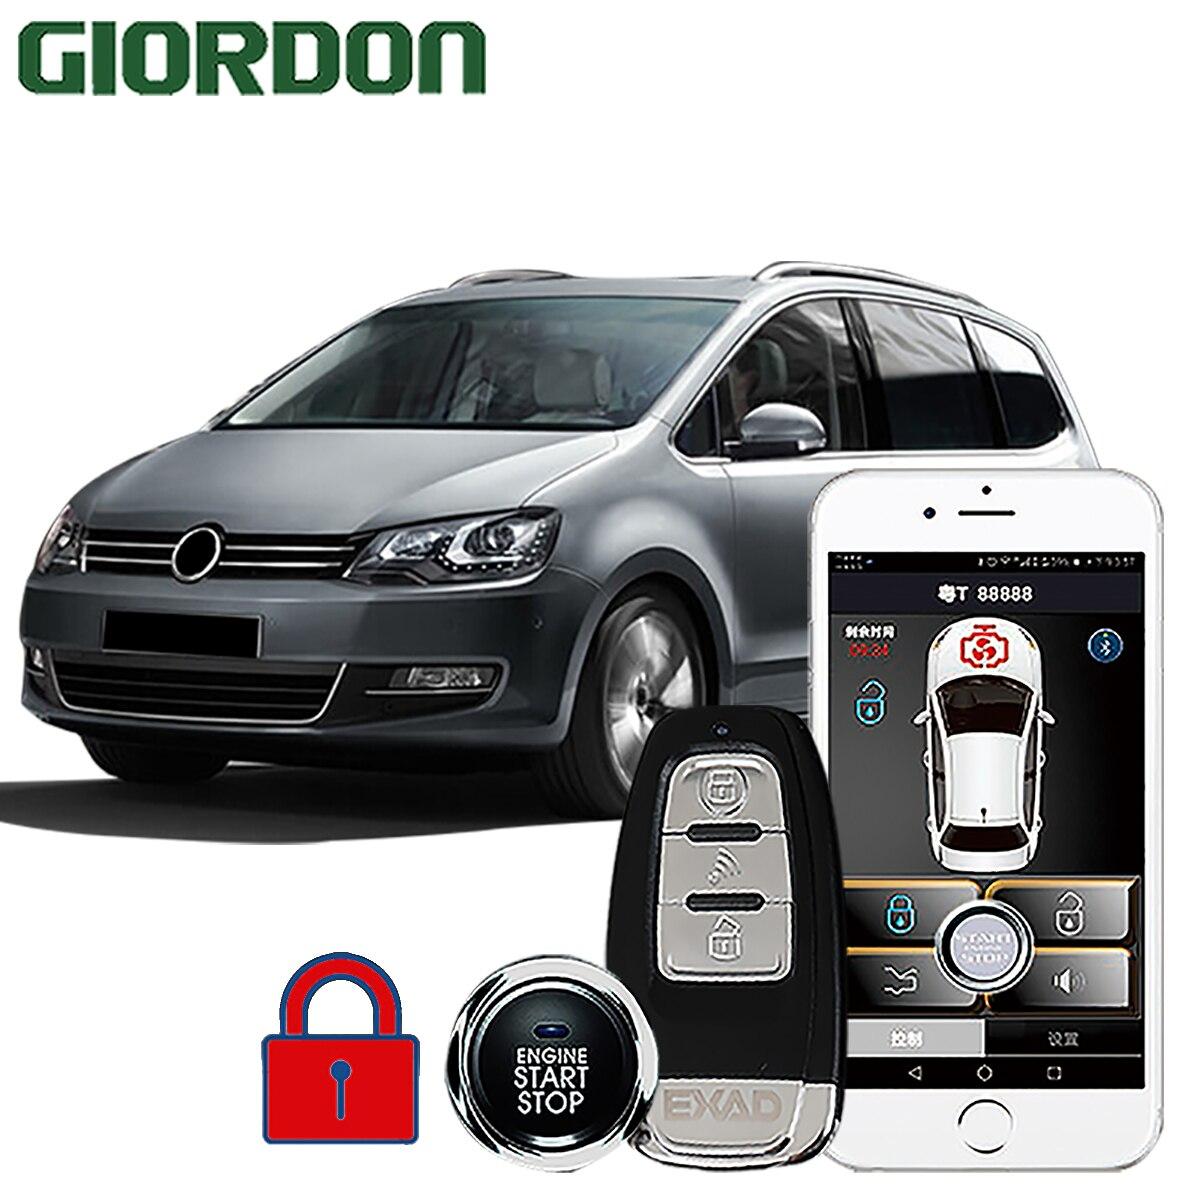 GIORDON SHARAN 2013  car accessories Keyless Entry Comfort System PKE Phone APP Remote Start Car Engine Car Alarm Push  913|Burglar Alarm| |  - title=